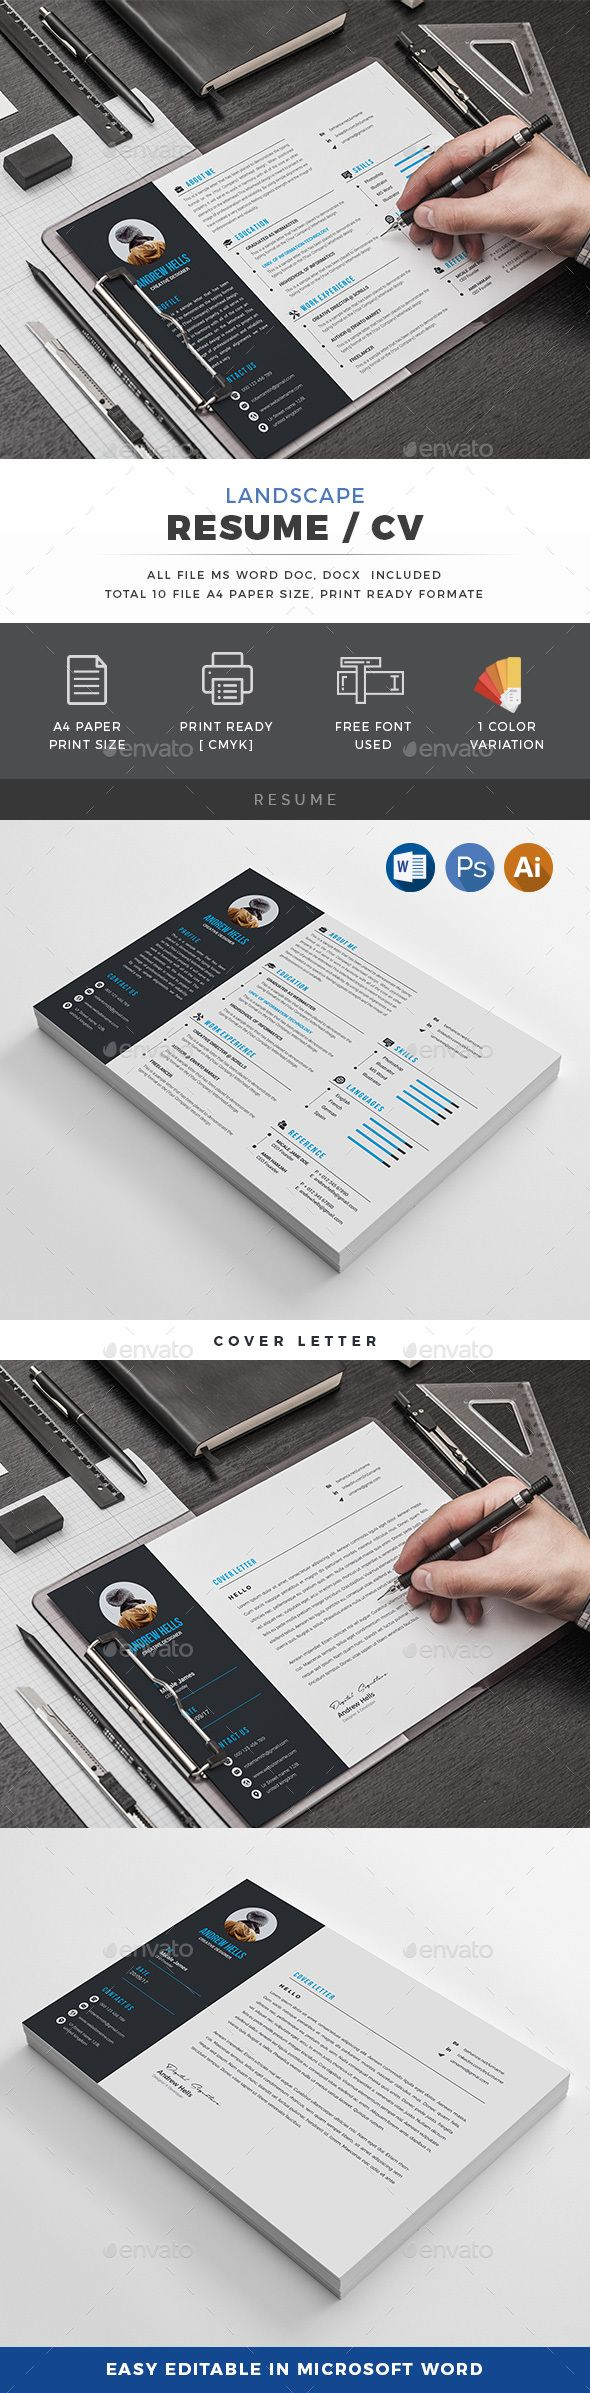 Landscape Resume | Cv template, Stationery design and Simple resume ...